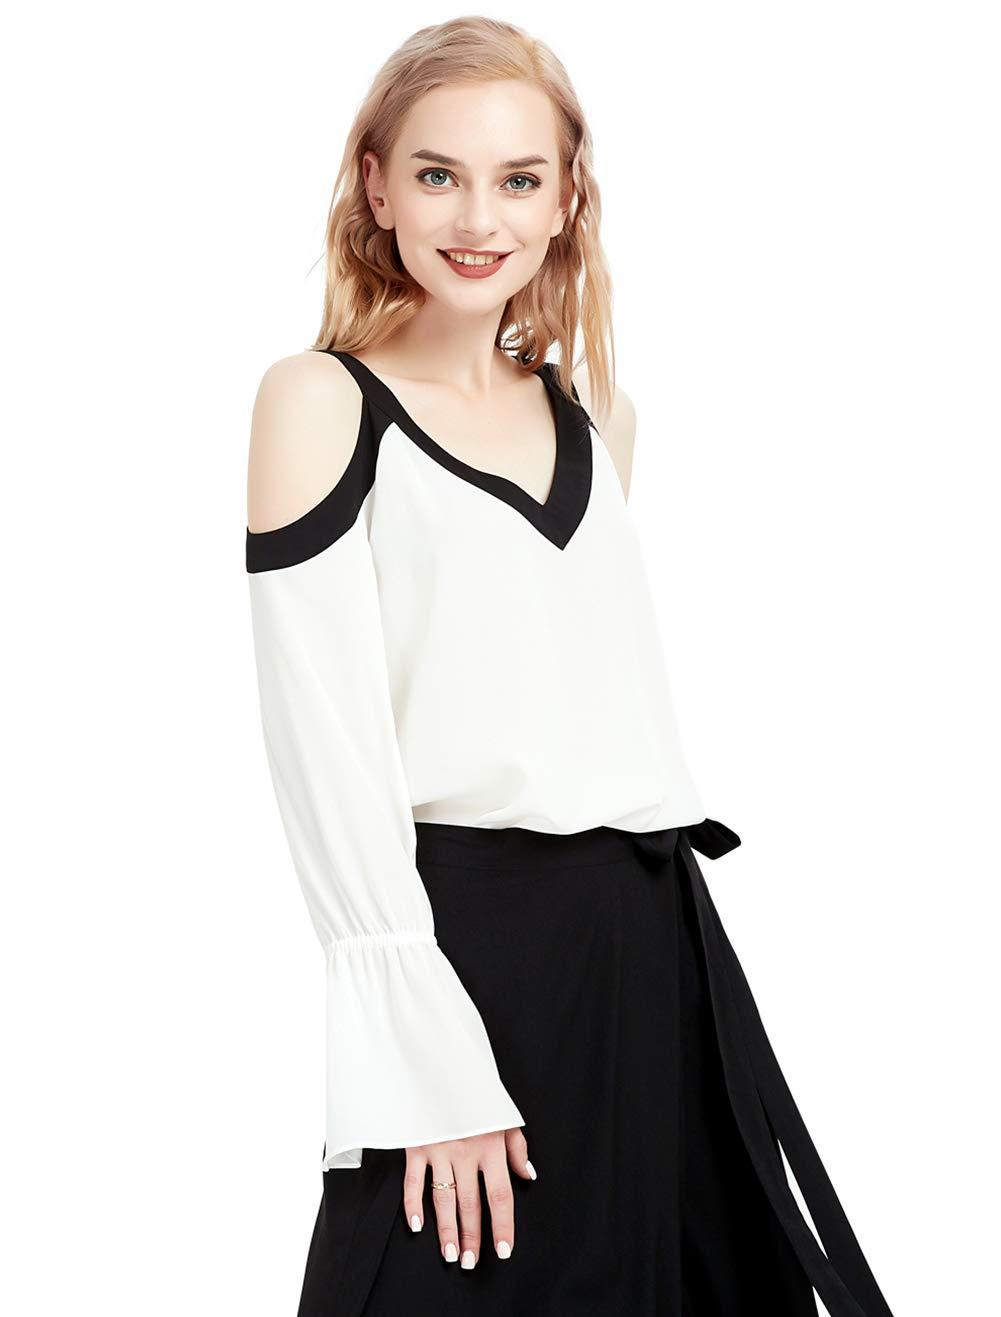 Basic Model Cold Shoulder Tops for Women Casual V/Round Neck Short/Long Sleeve Blouses Shirts